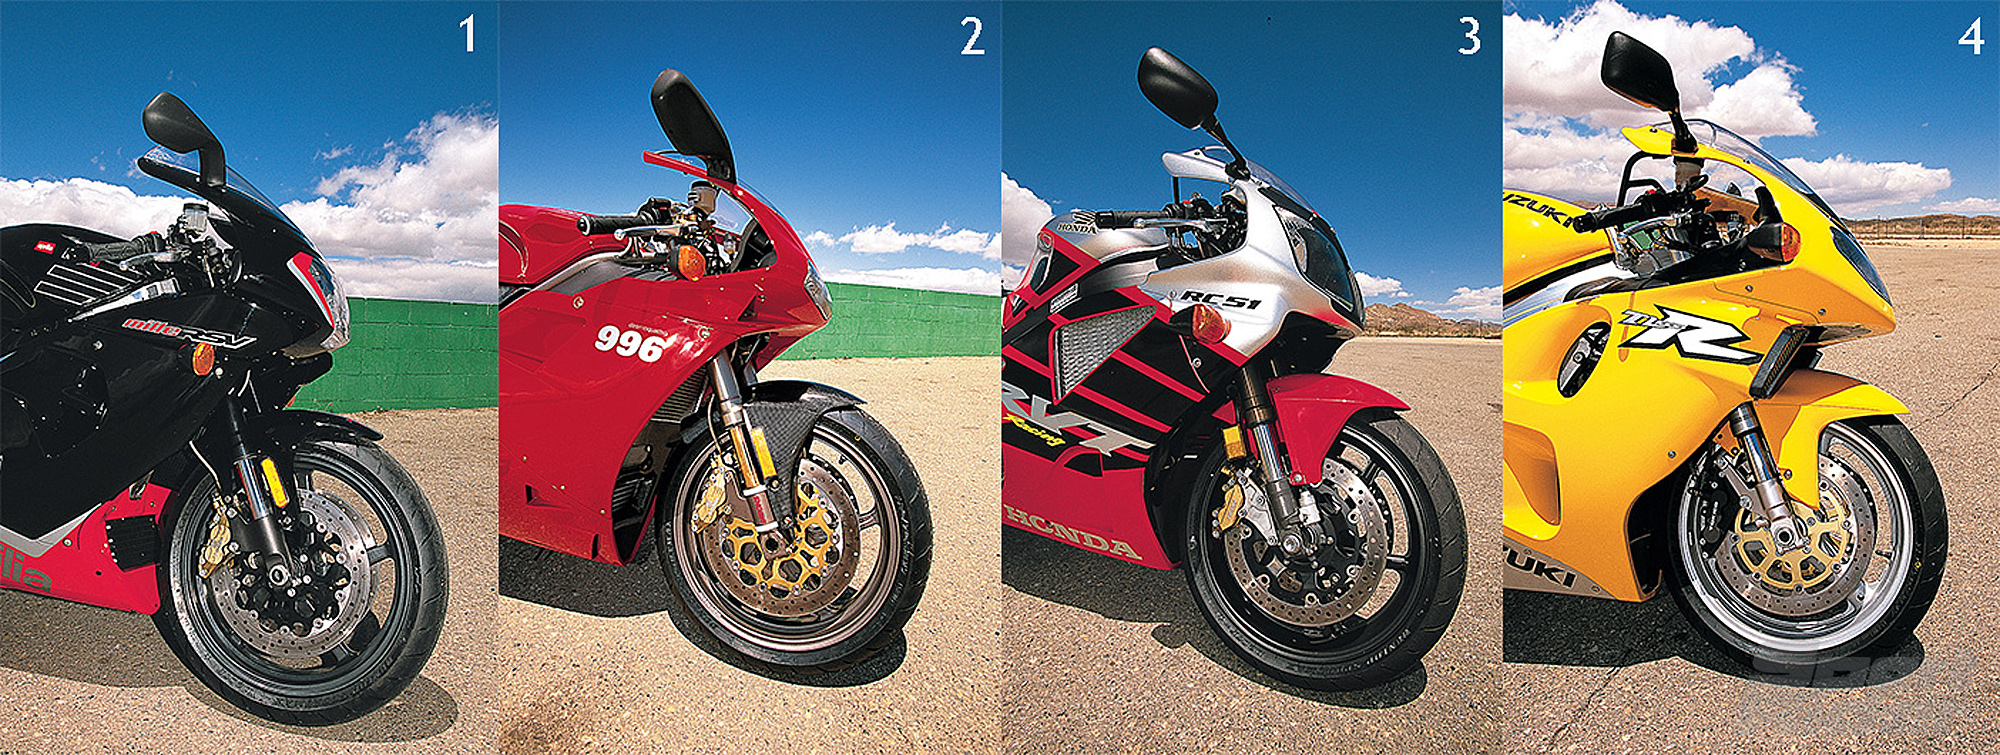 hight resolution of v twin comparison of the ducati 996 vs aprilia rsv mille vs honda rc51 vs suzuki tl1000r from the archives cycle world